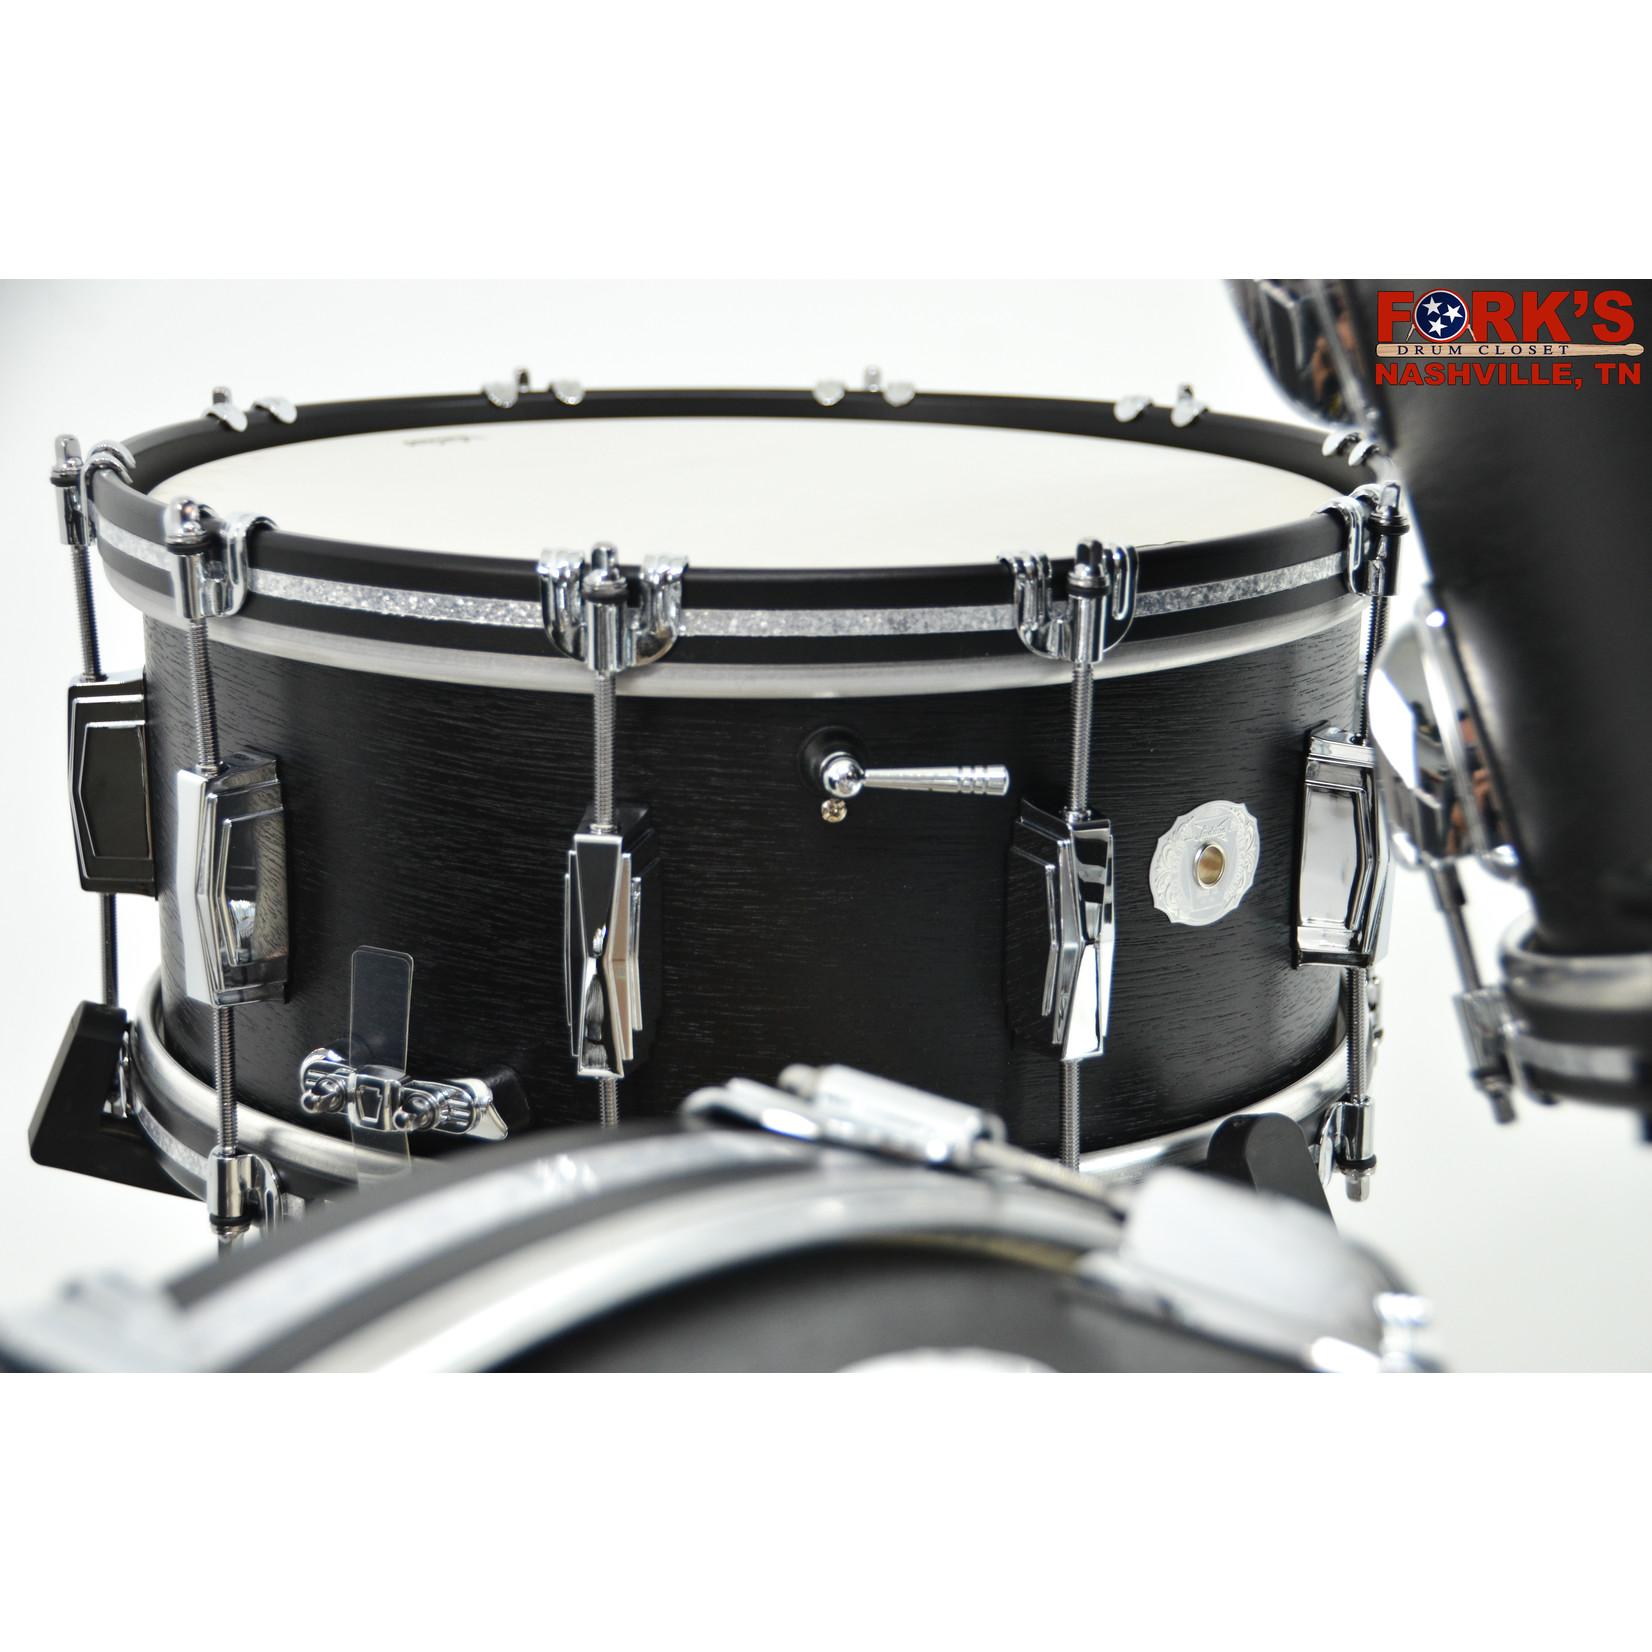 "Ludwig Ludwig Legacy Mahogany "" Black Cat"" 6.5x14 Snare Drum"